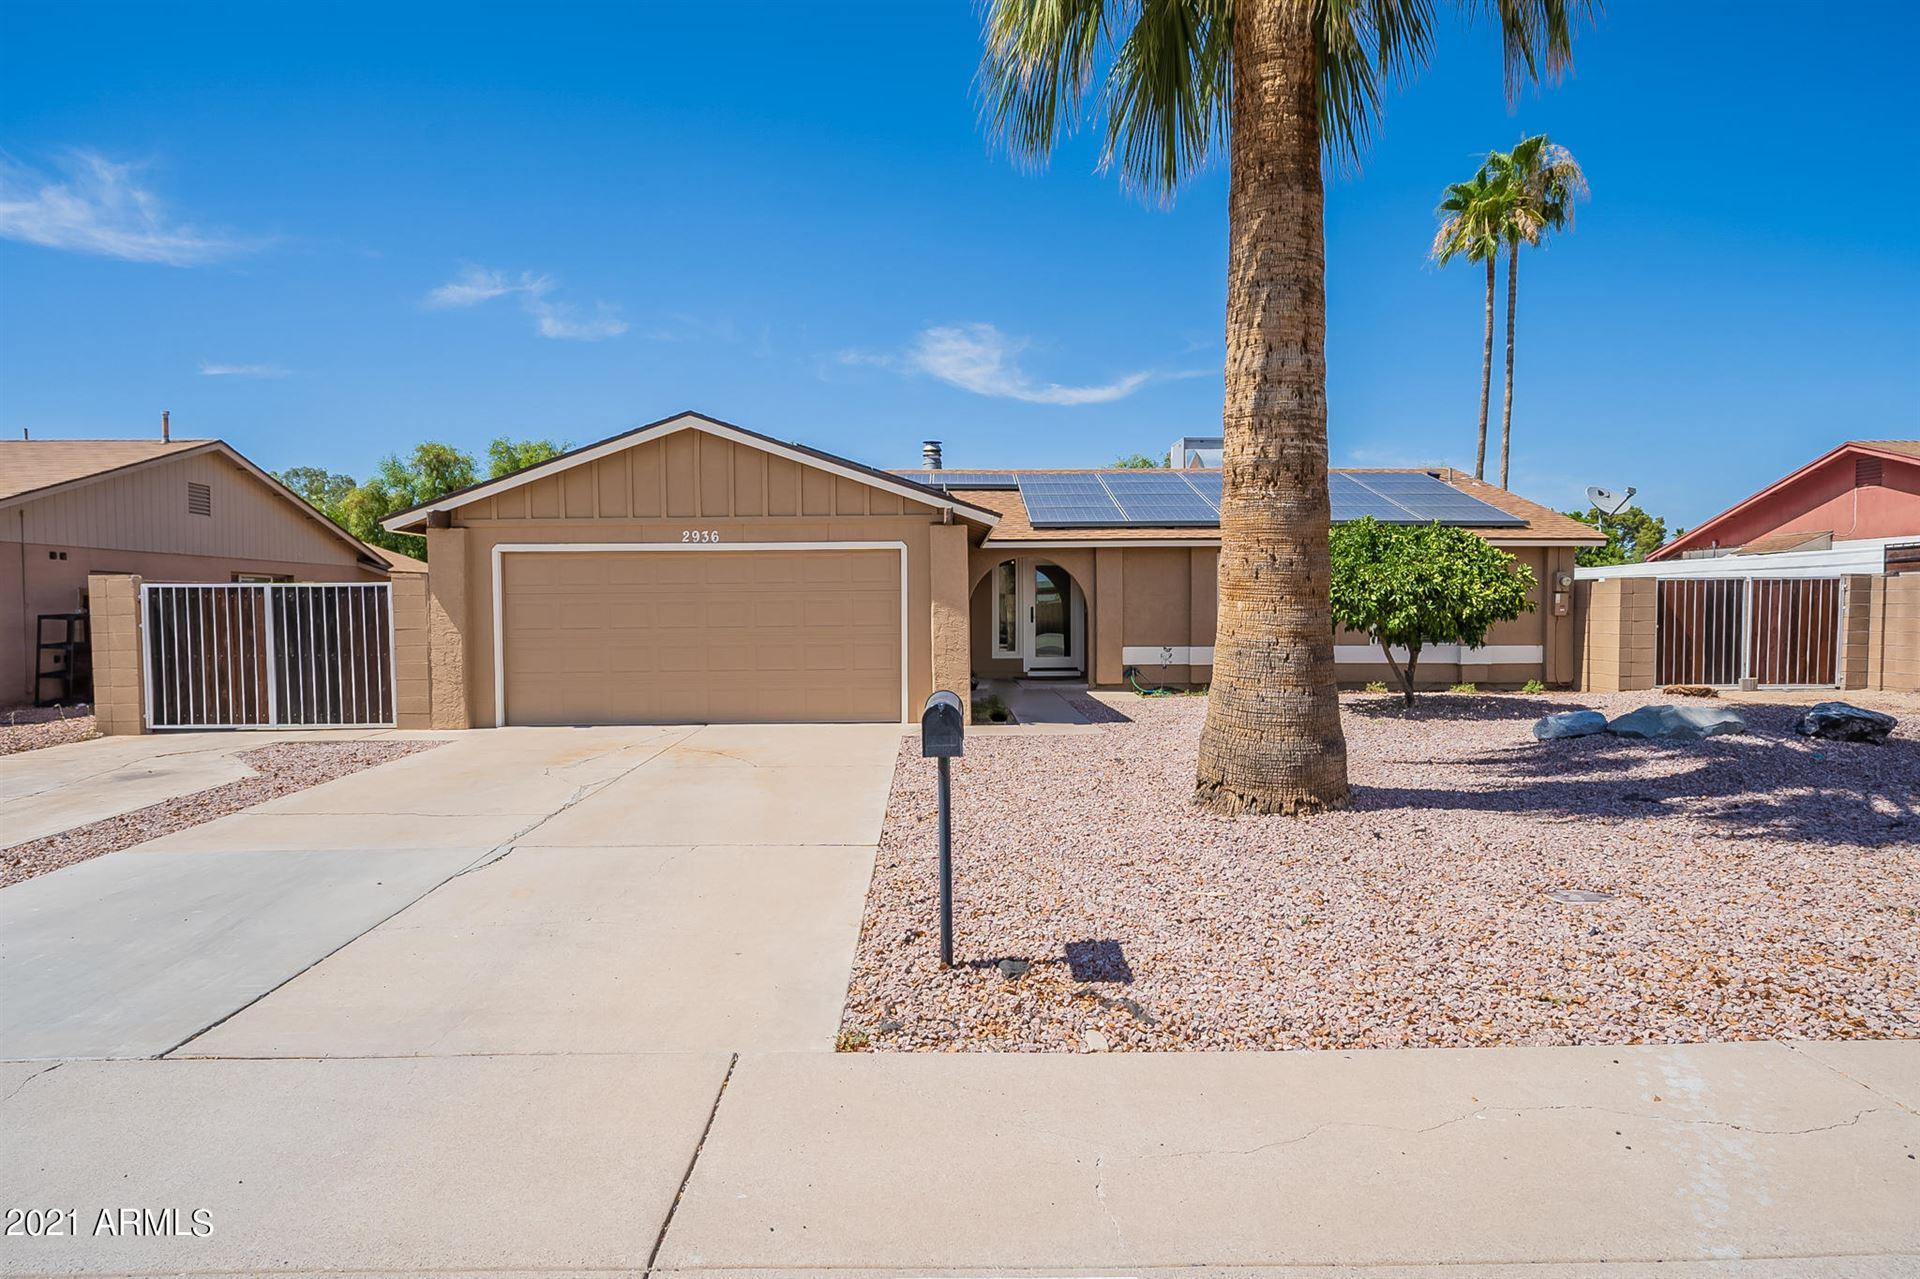 2936 W ANDERSON Drive, Phoenix, AZ 85053 - MLS#: 6246278